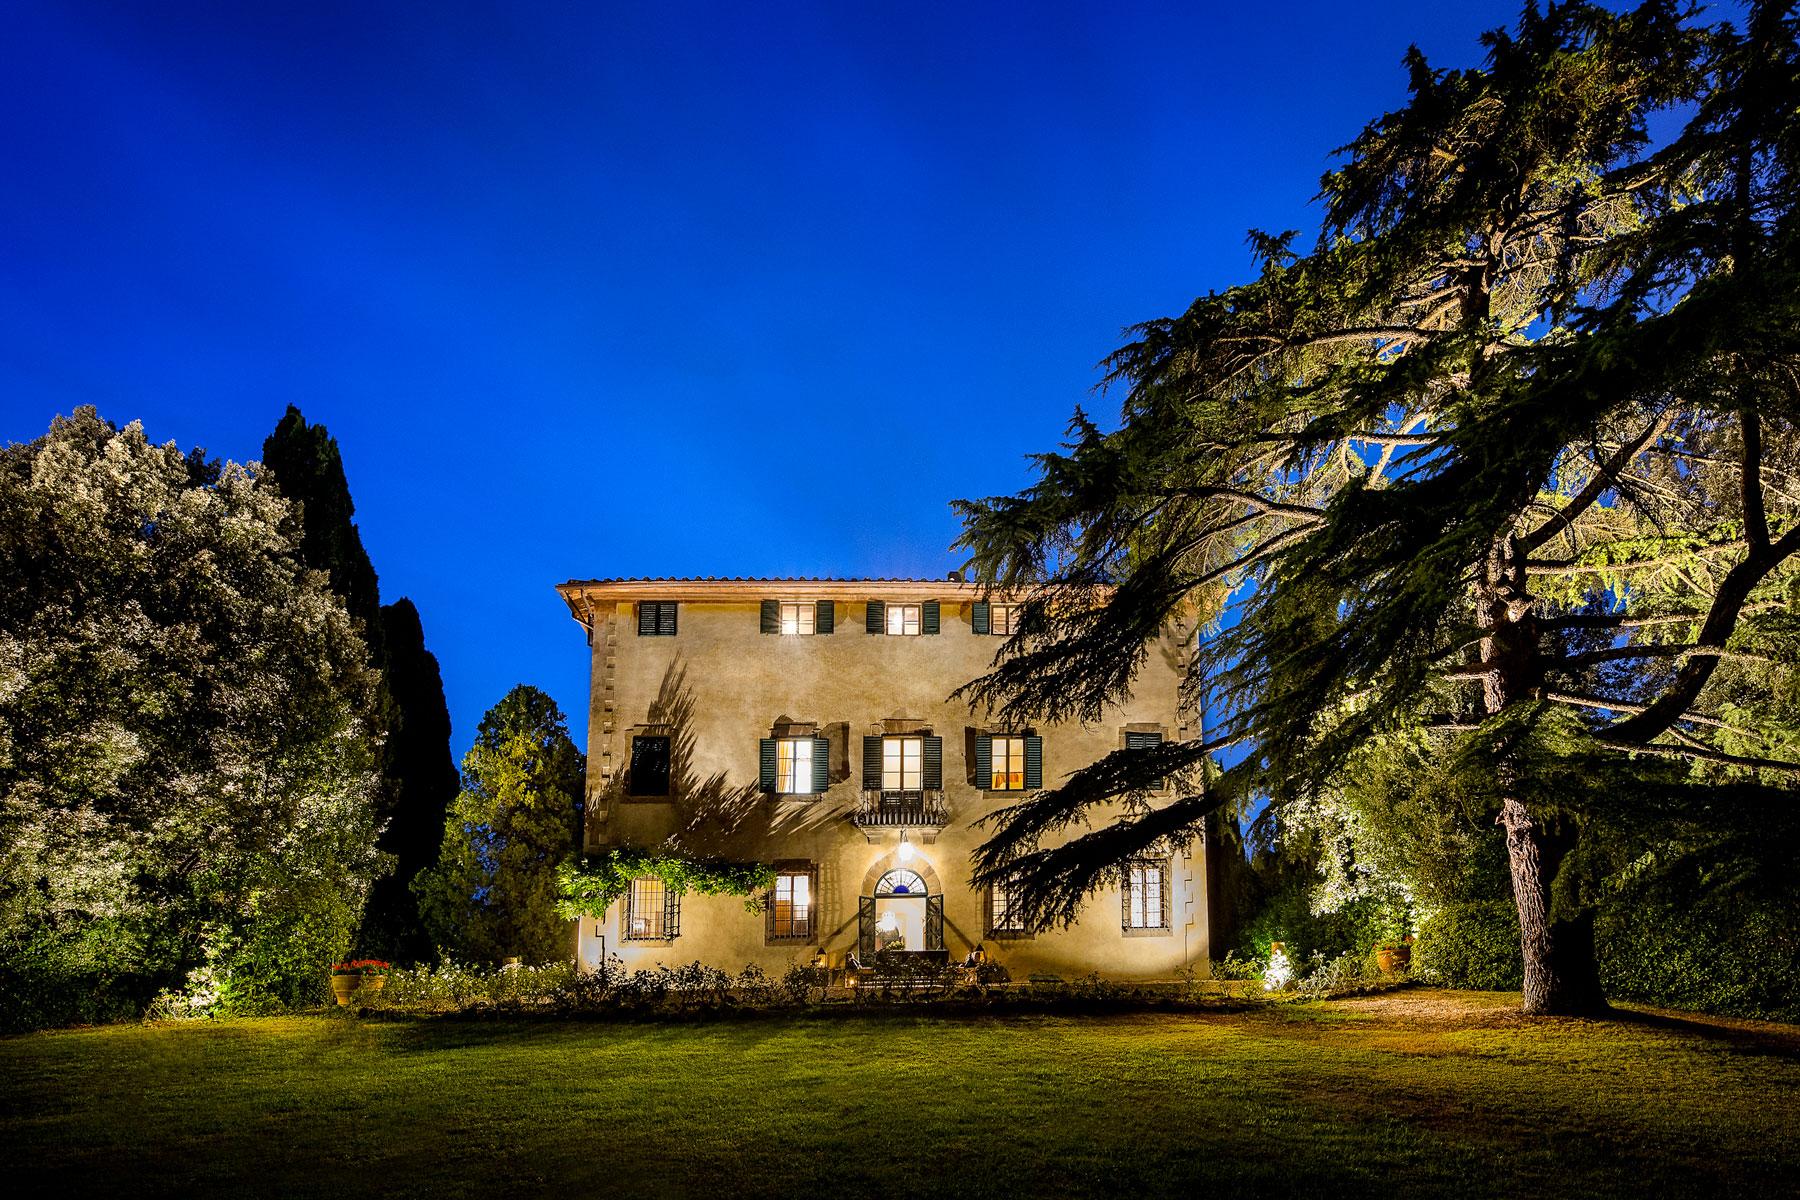 Villa<br>Mezzomonte with pool